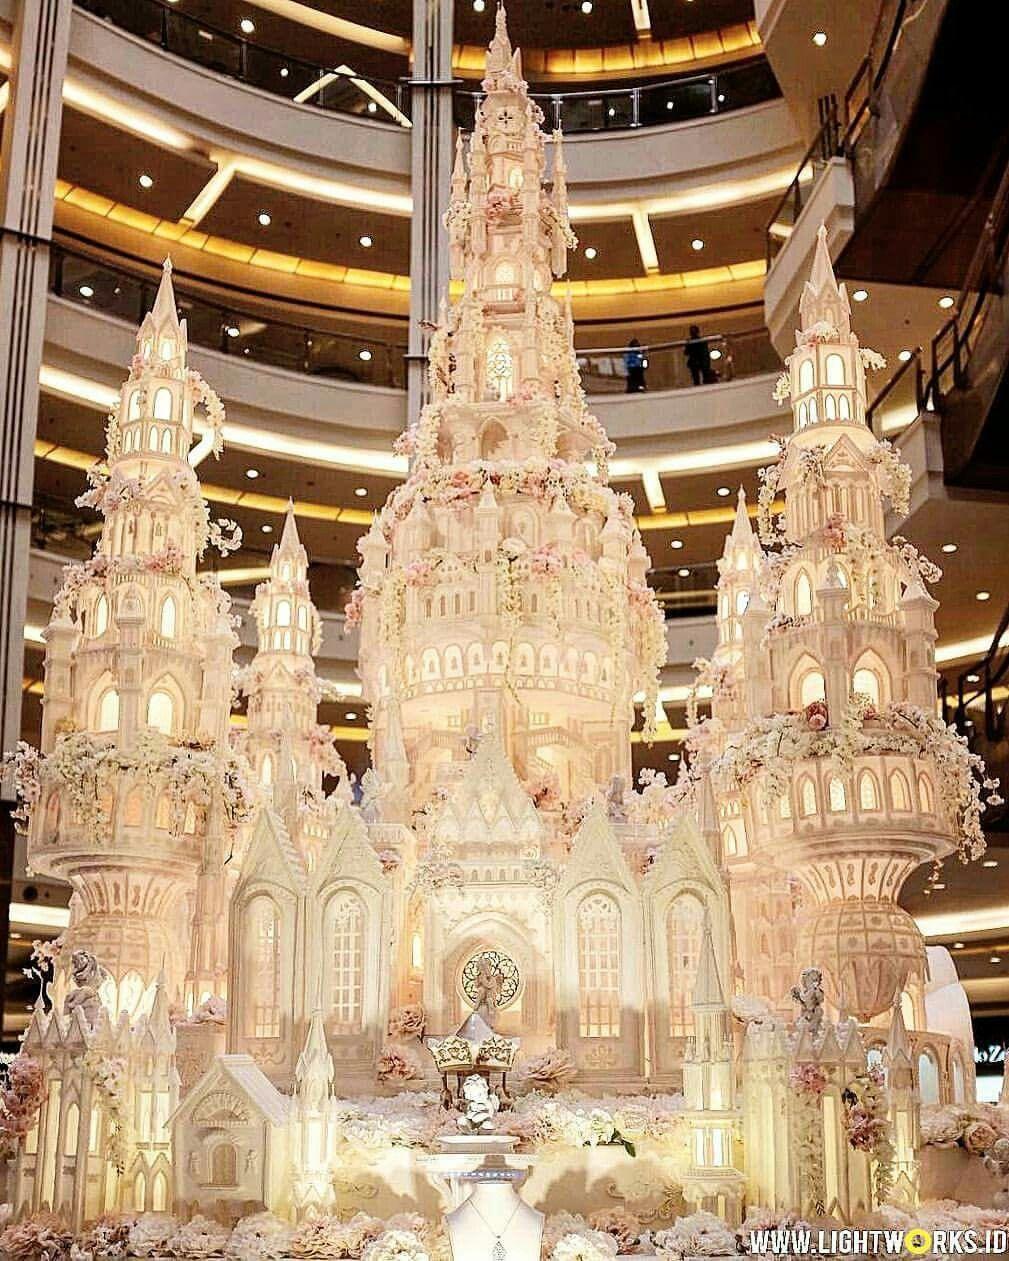 LeNovelle Cake in 2019 Castle wedding cake, Extravagant